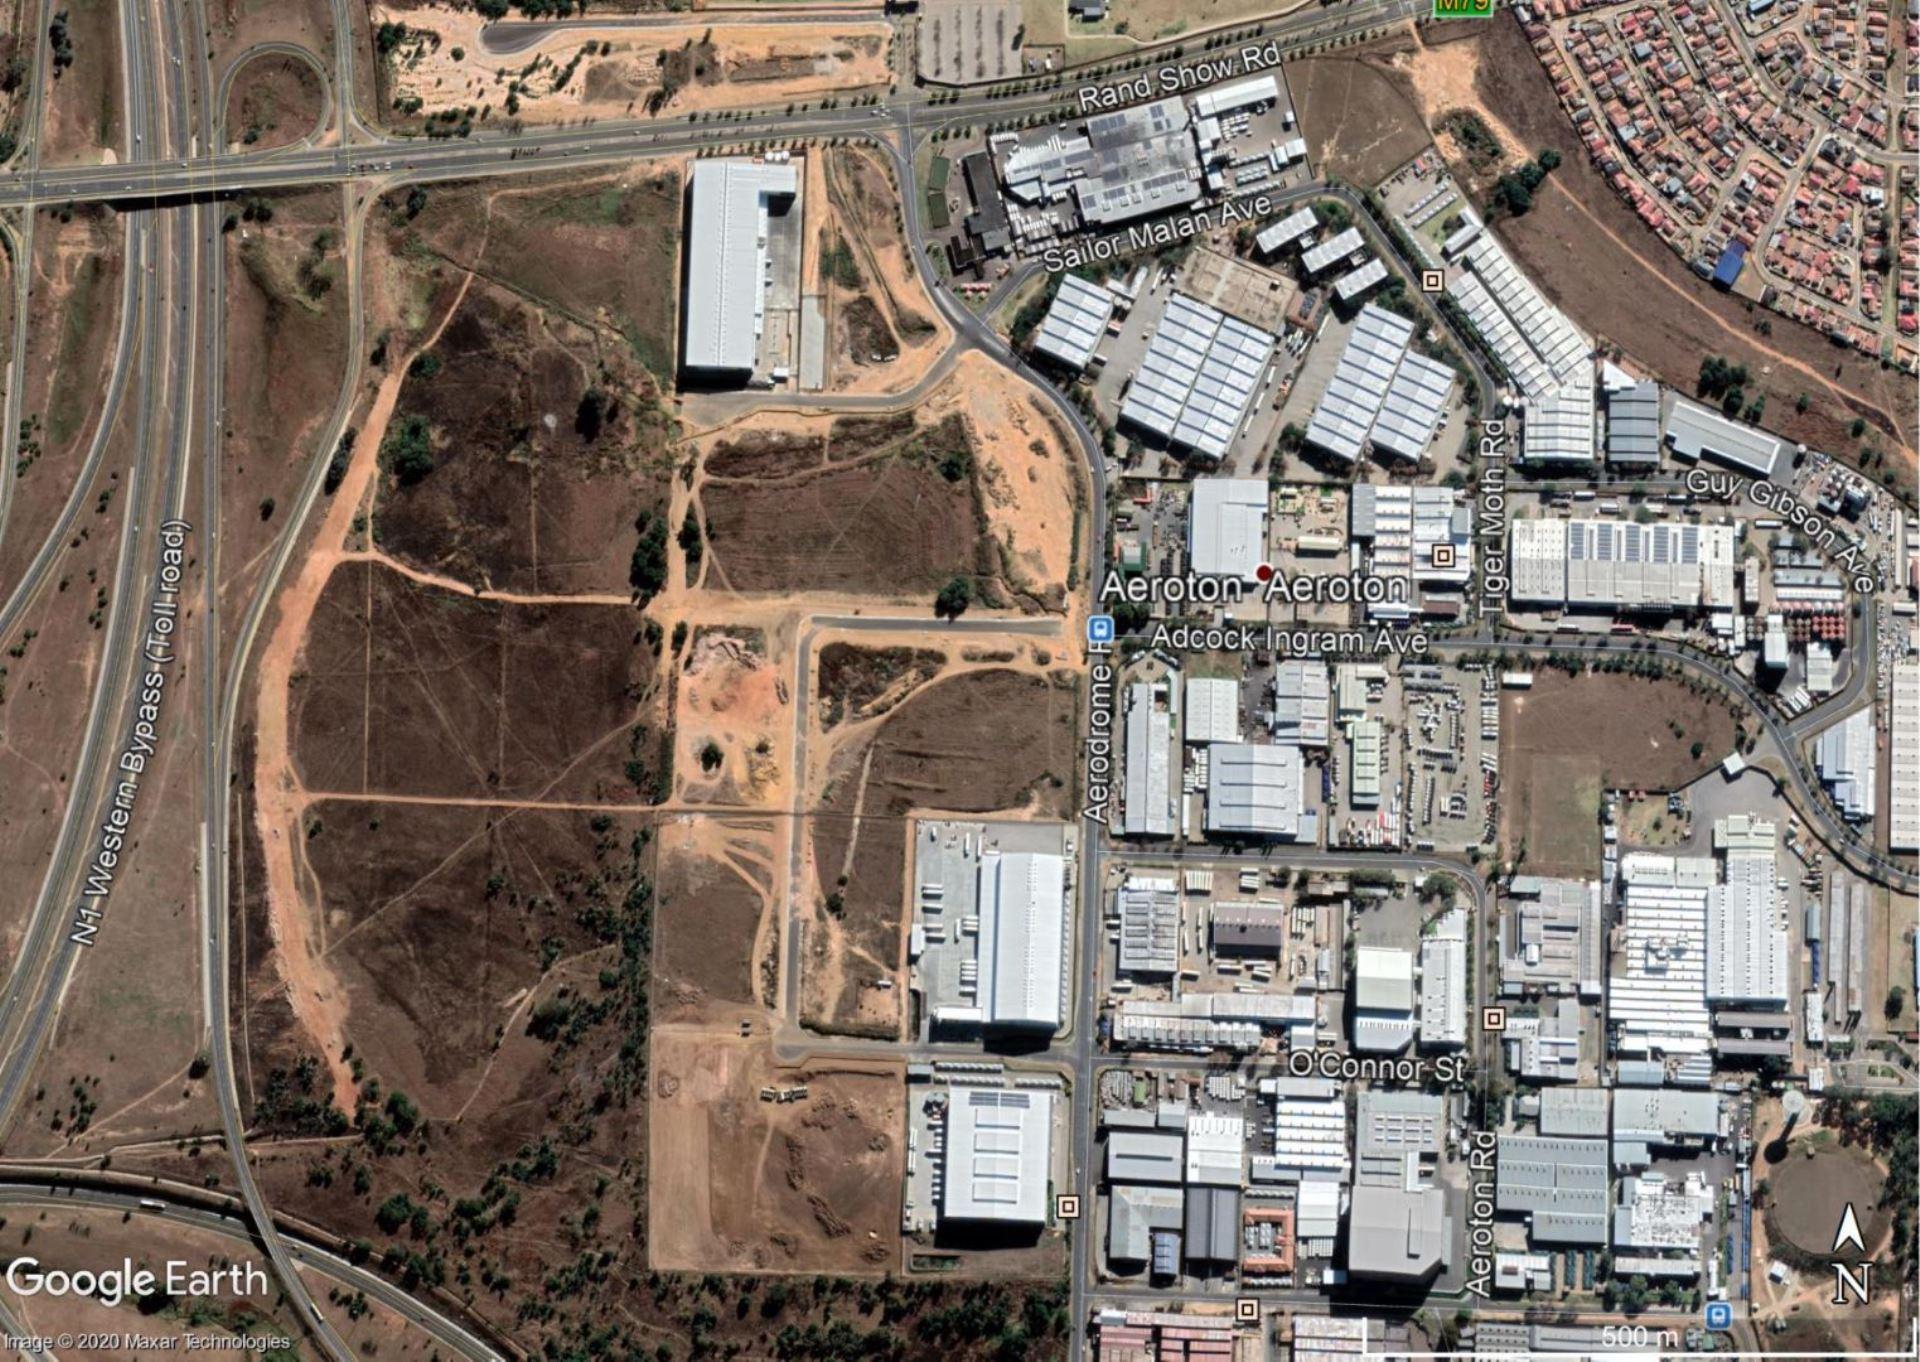 Development Land Aeroton Industria